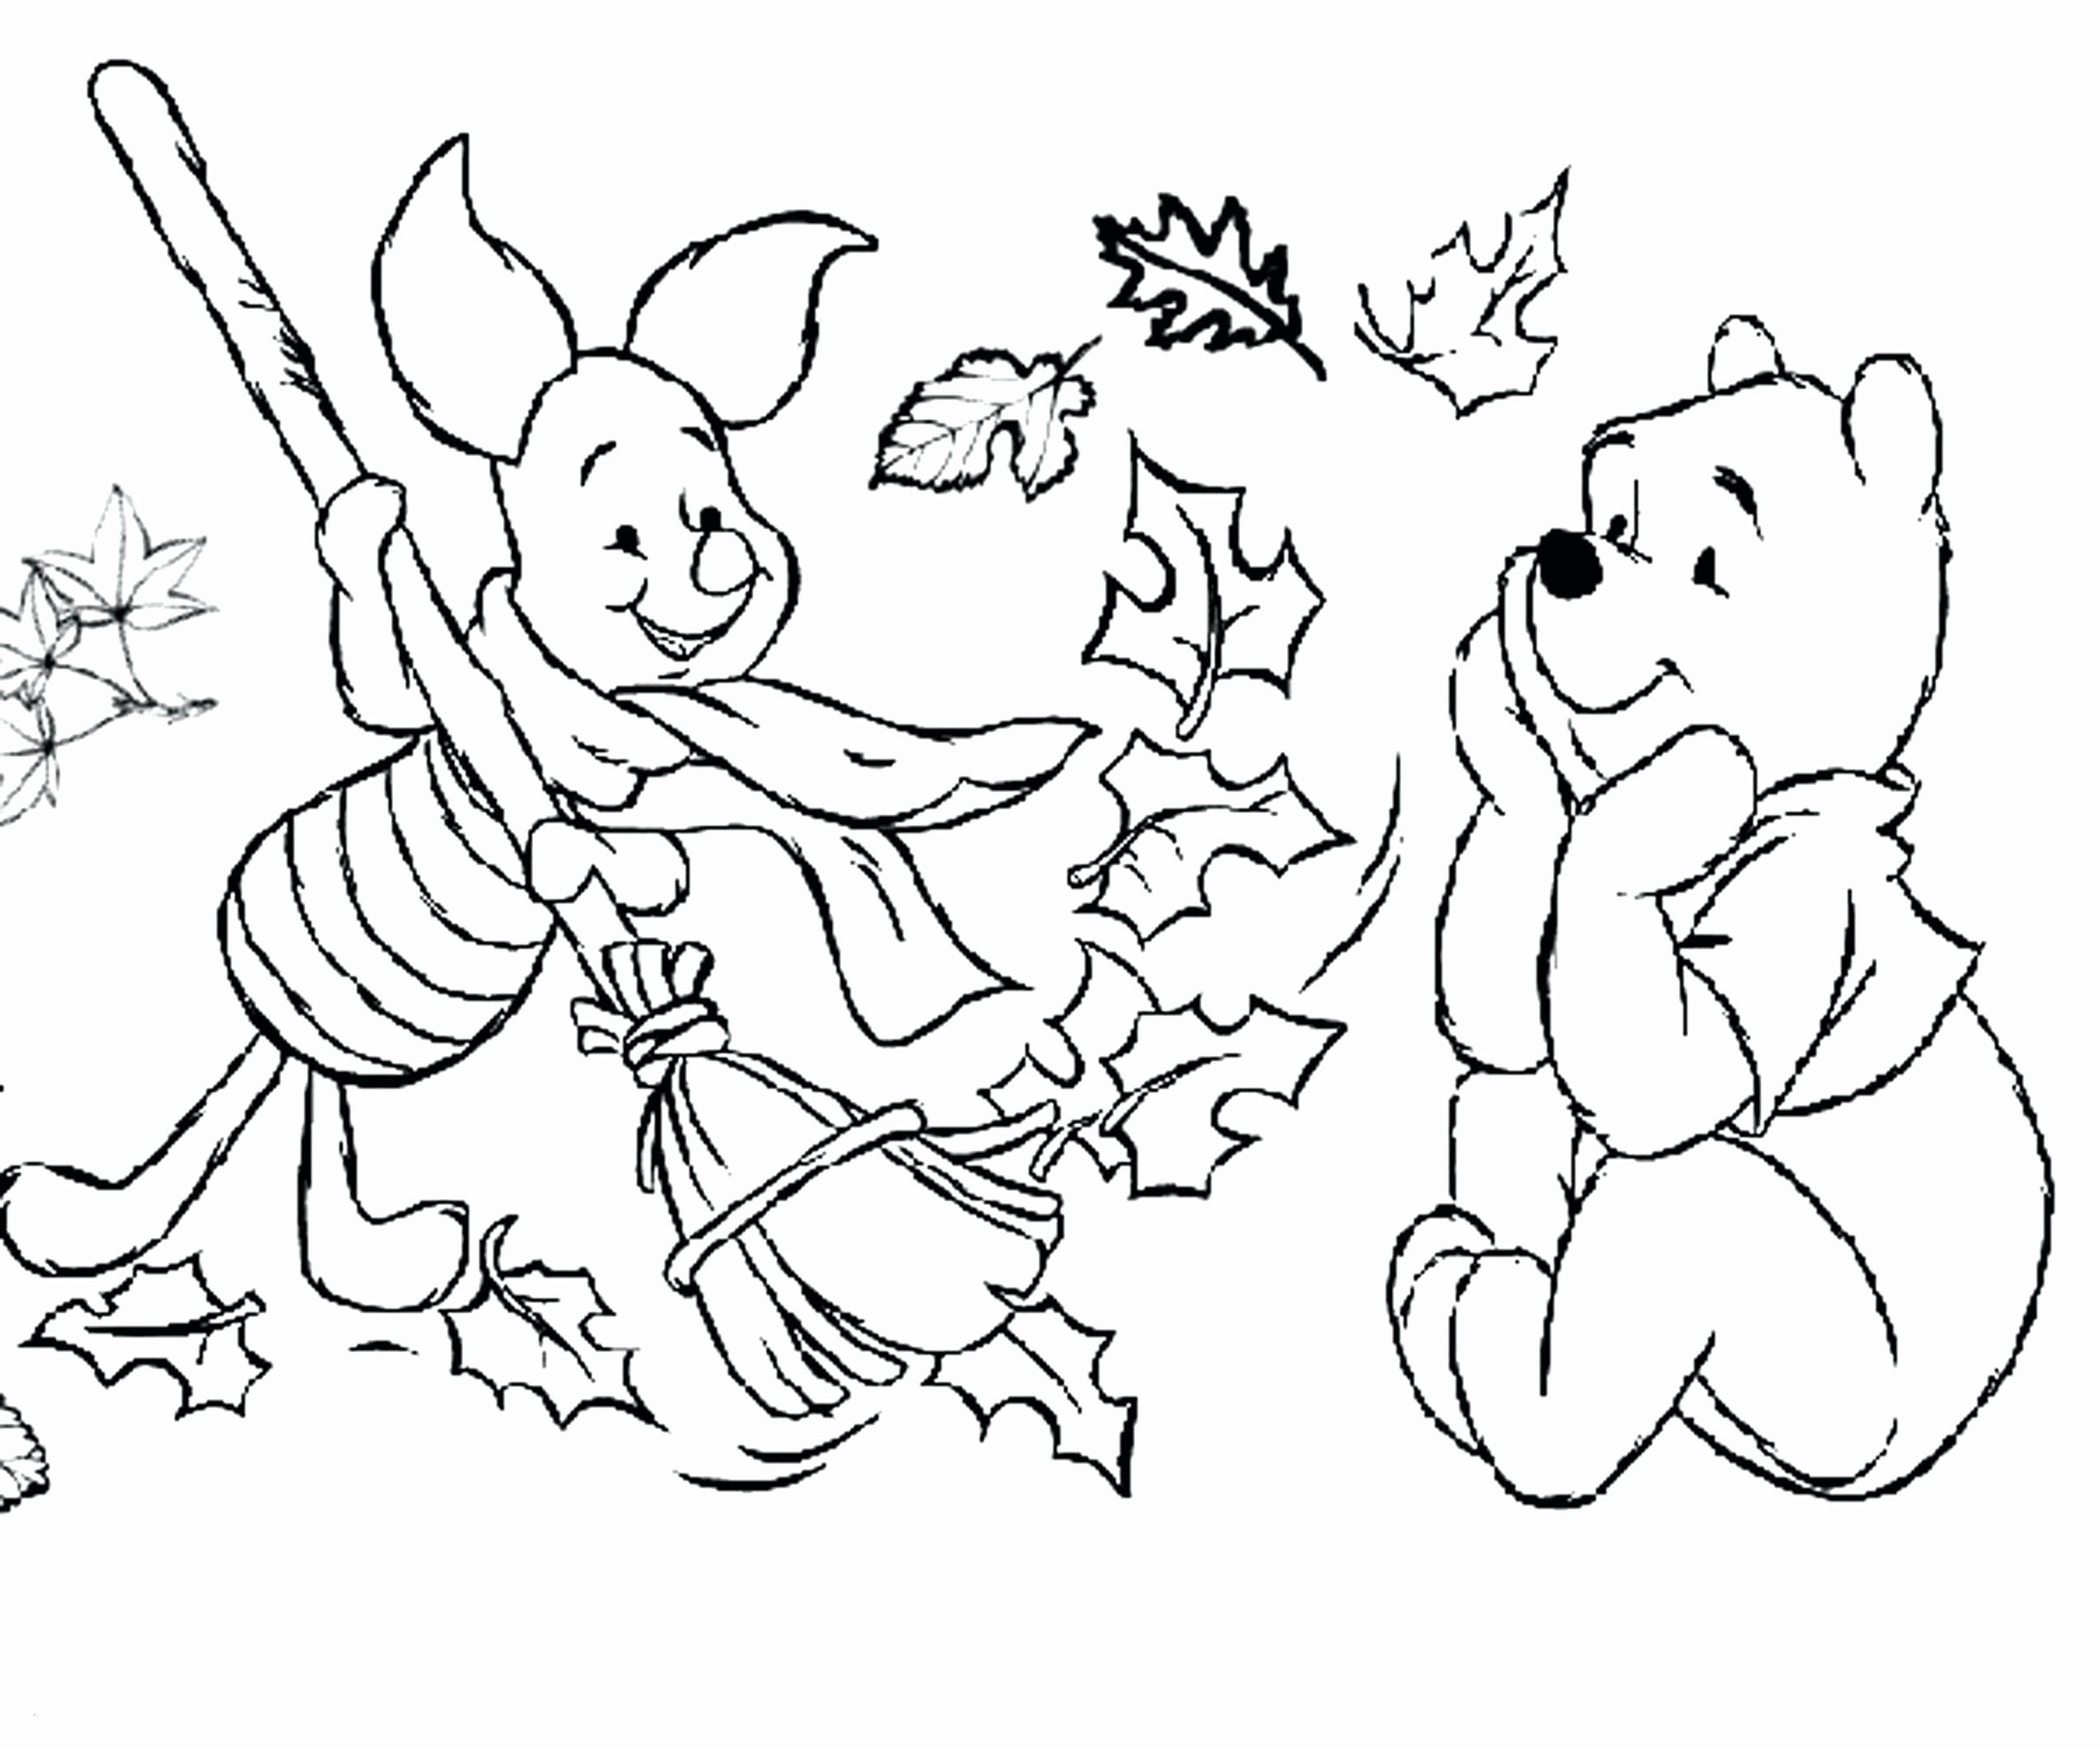 Malvorlage Robin Hood Genial Ausmalbilder I Love You Frisch Luxury sonic Coloring Pages Letramac Stock